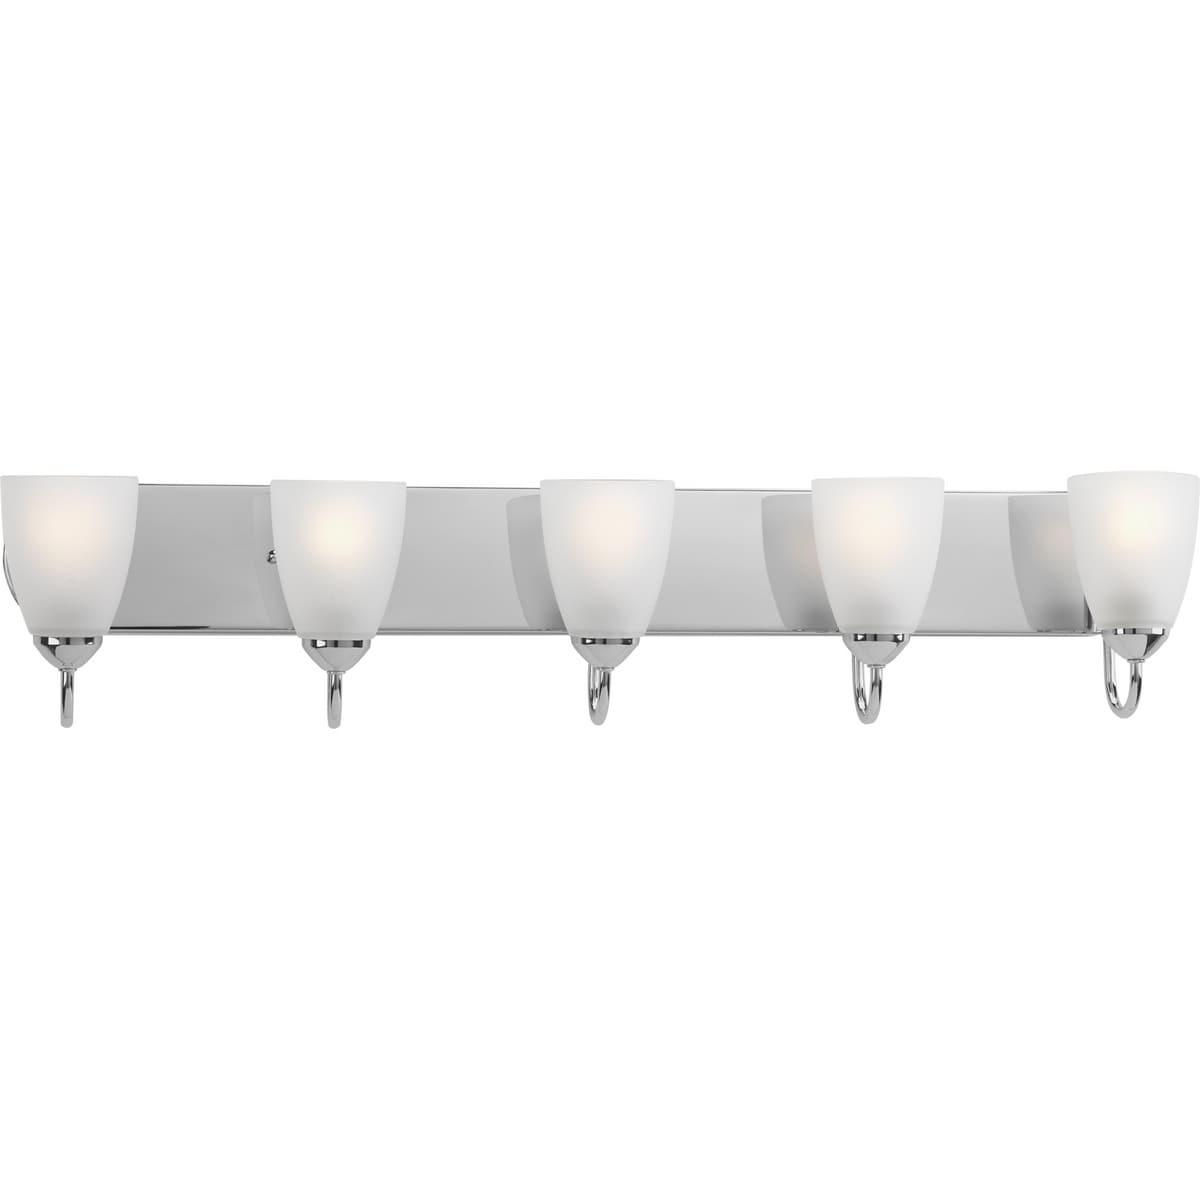 Shop Progress Lighting Silvertone Gather Collection 5 Light Polished Chrome Bath Light Overstock 9349264